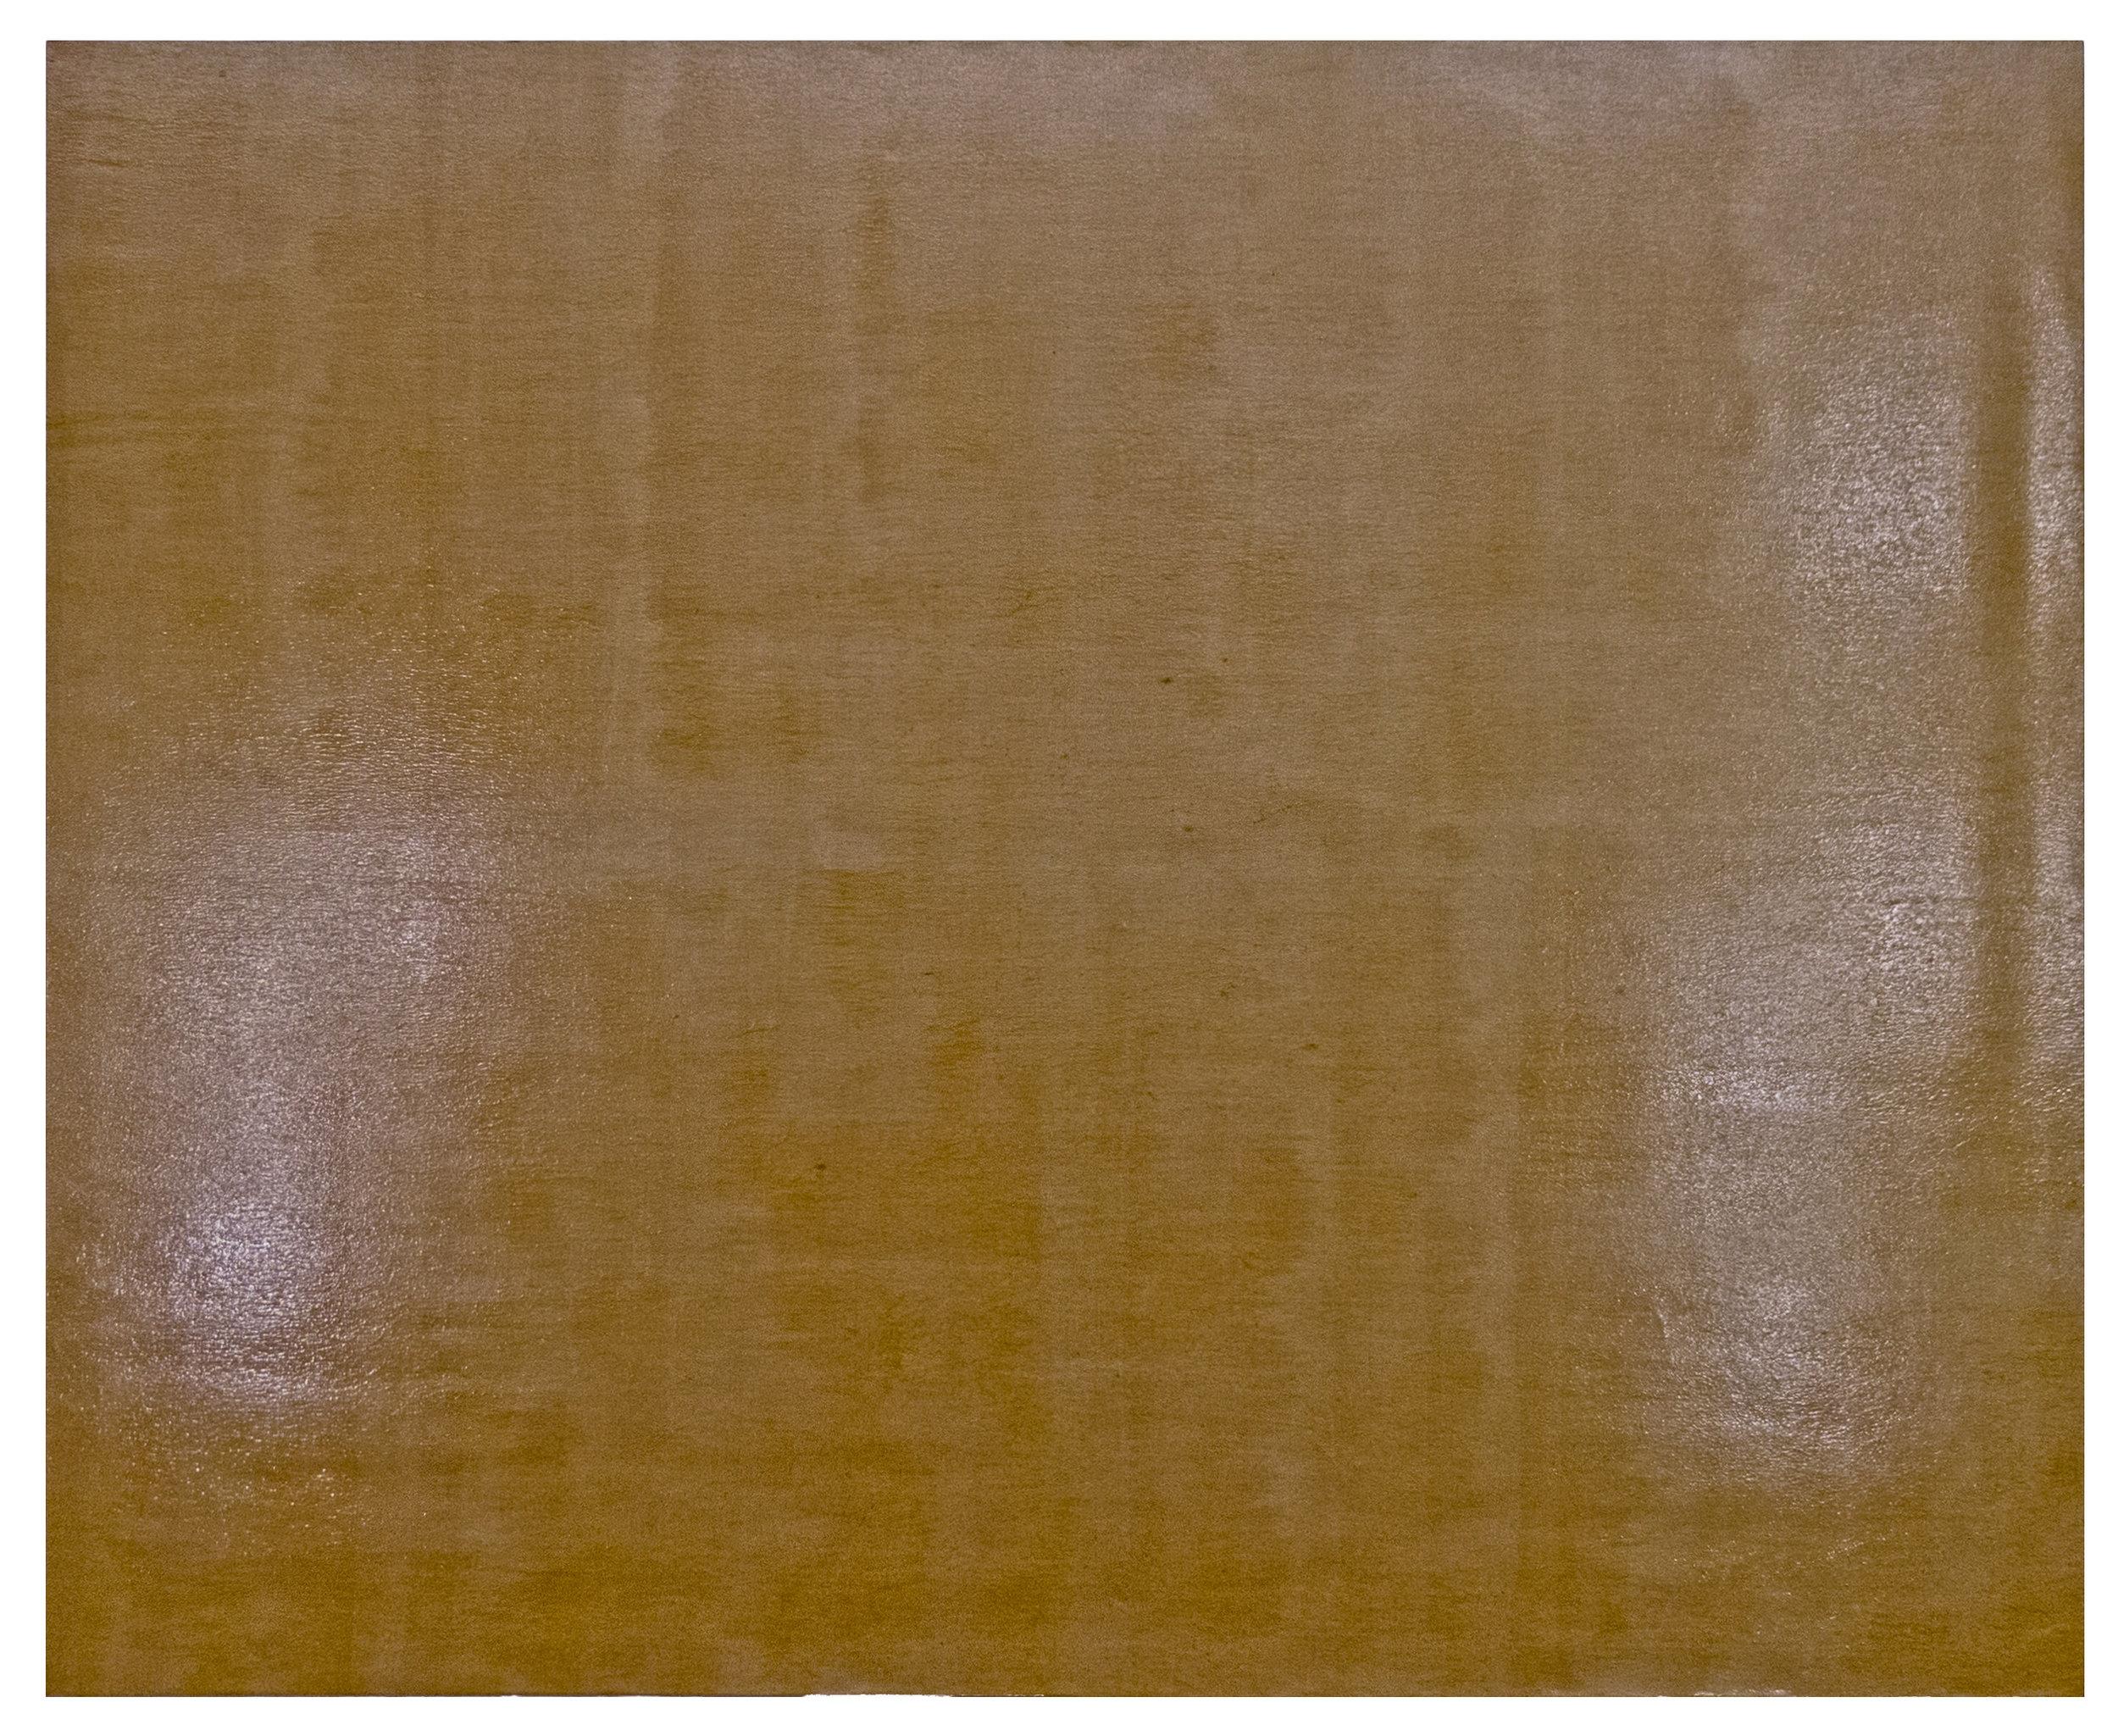 "Kweye, Resin/emulsion on unpainted linen, 80 x 100"""